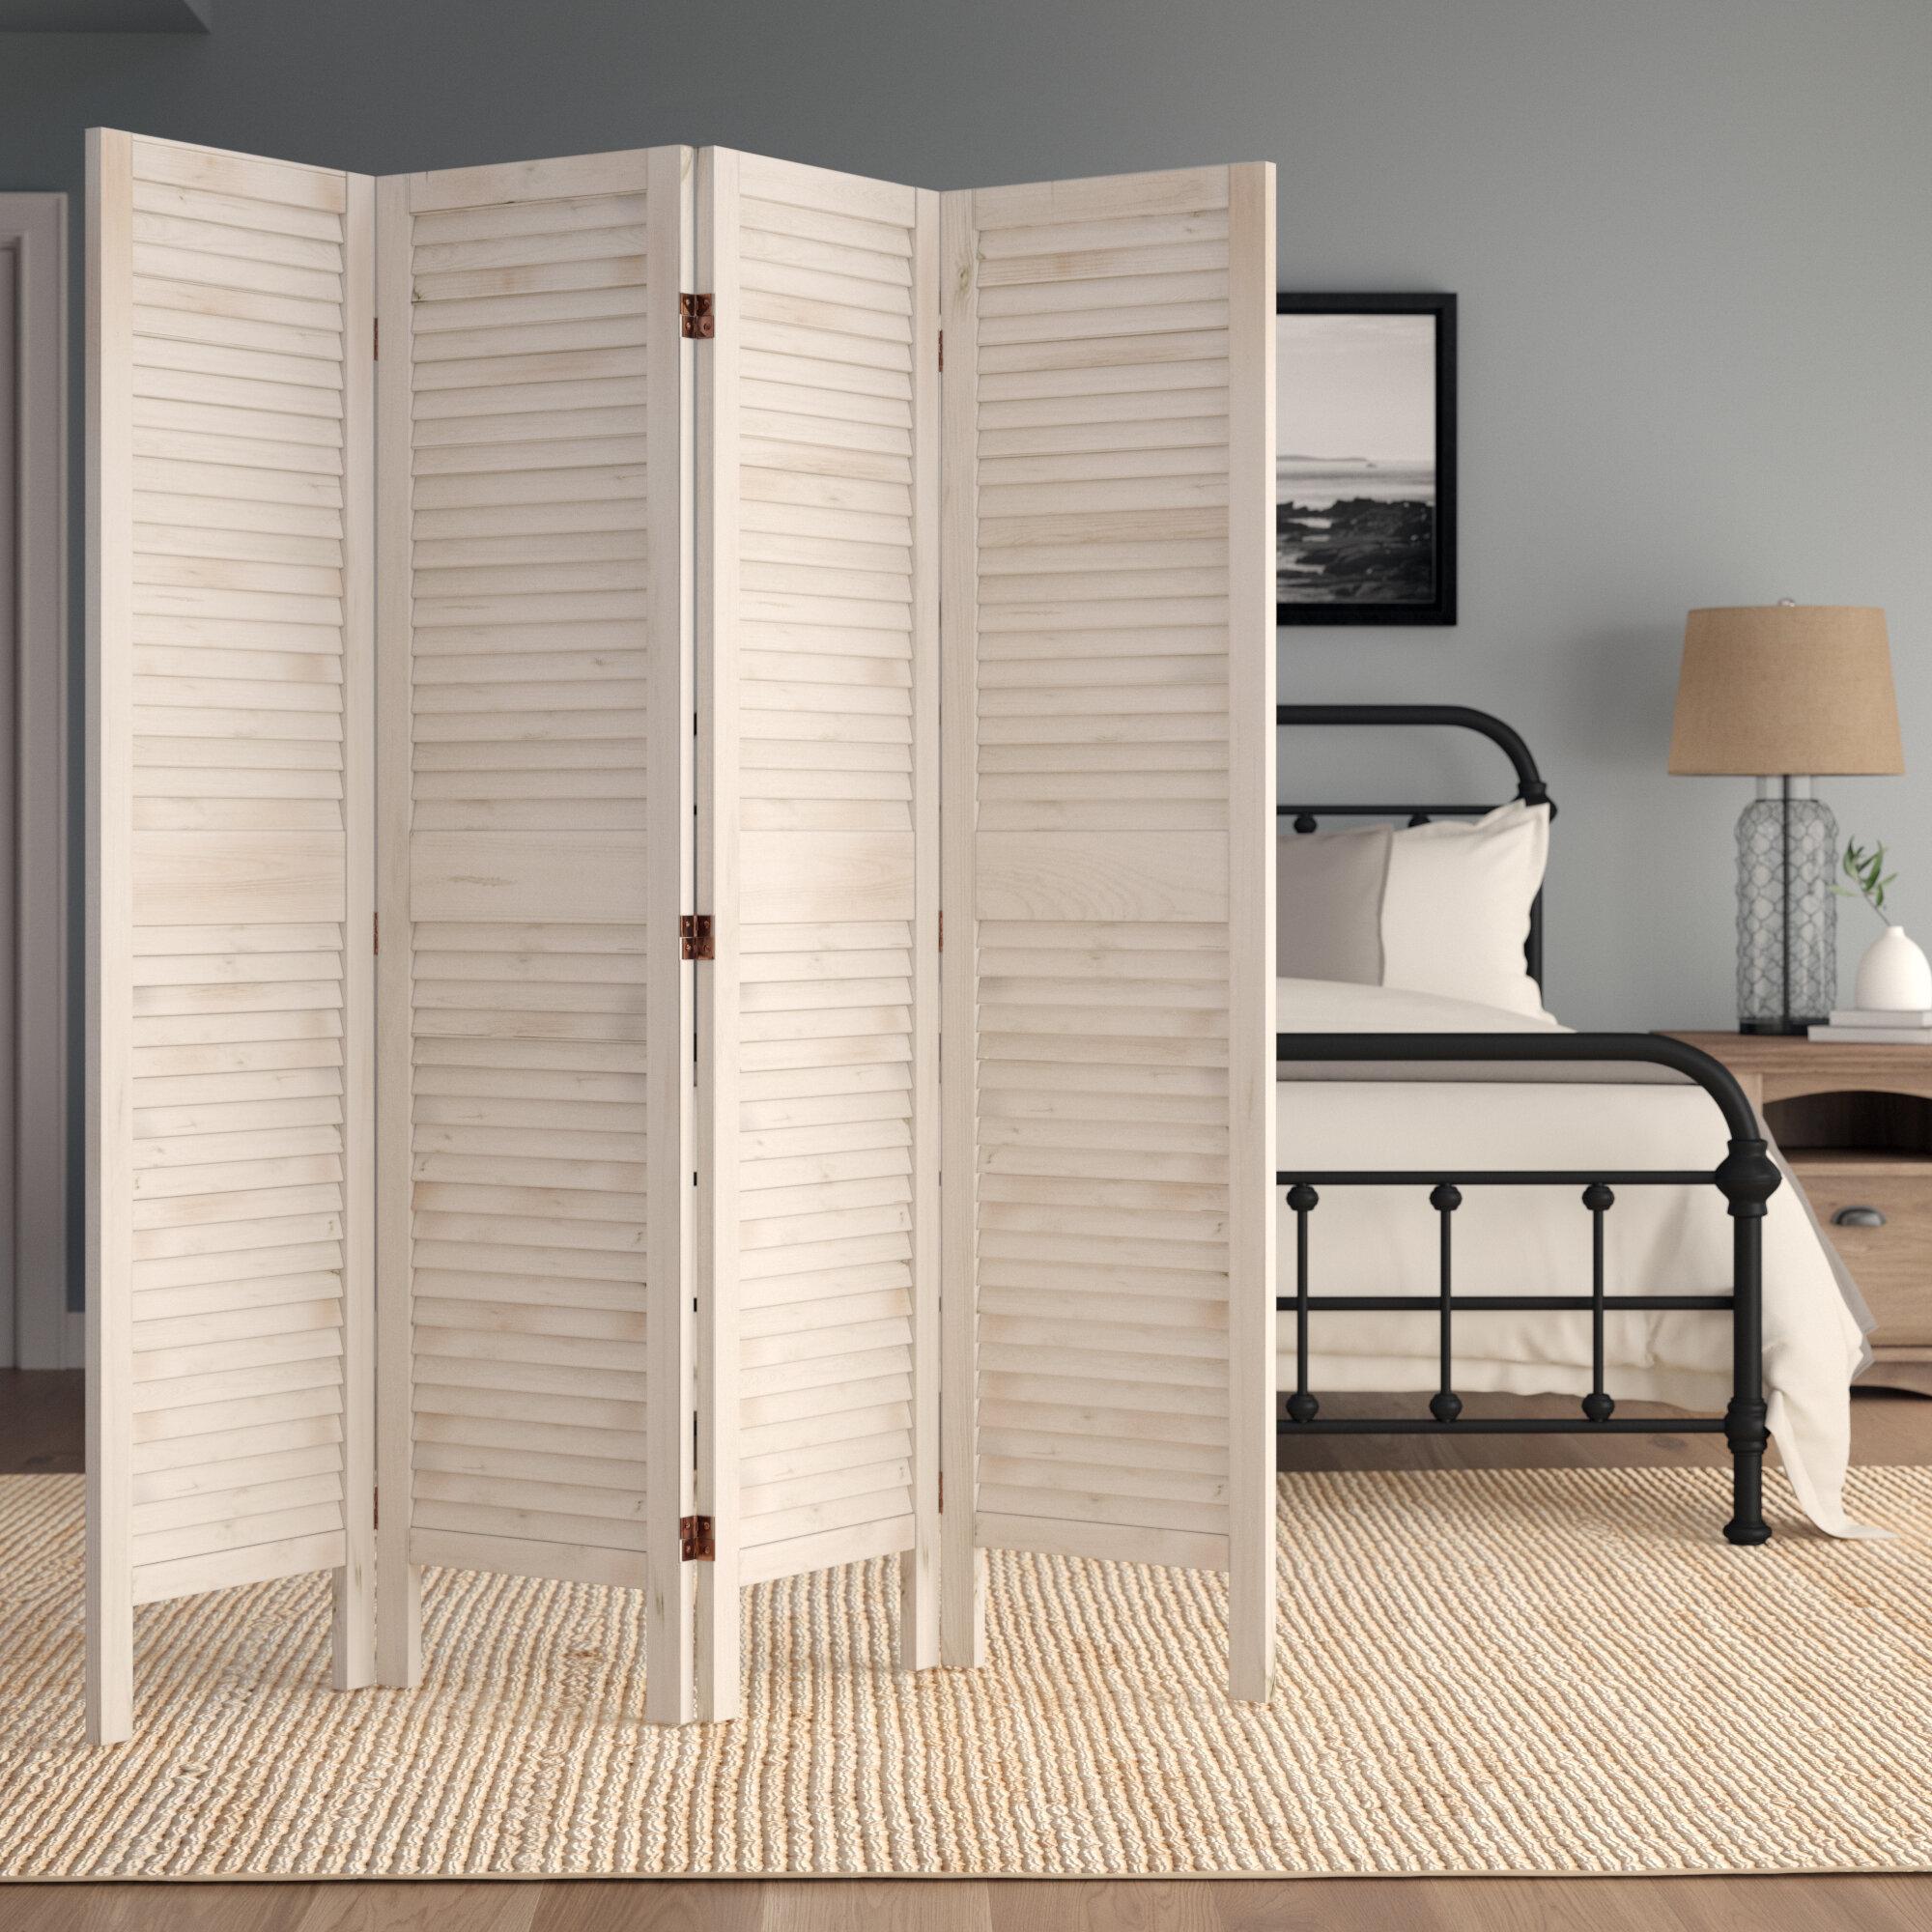 Outstanding Kathlene 4 Panel Room Divider Download Free Architecture Designs Scobabritishbridgeorg